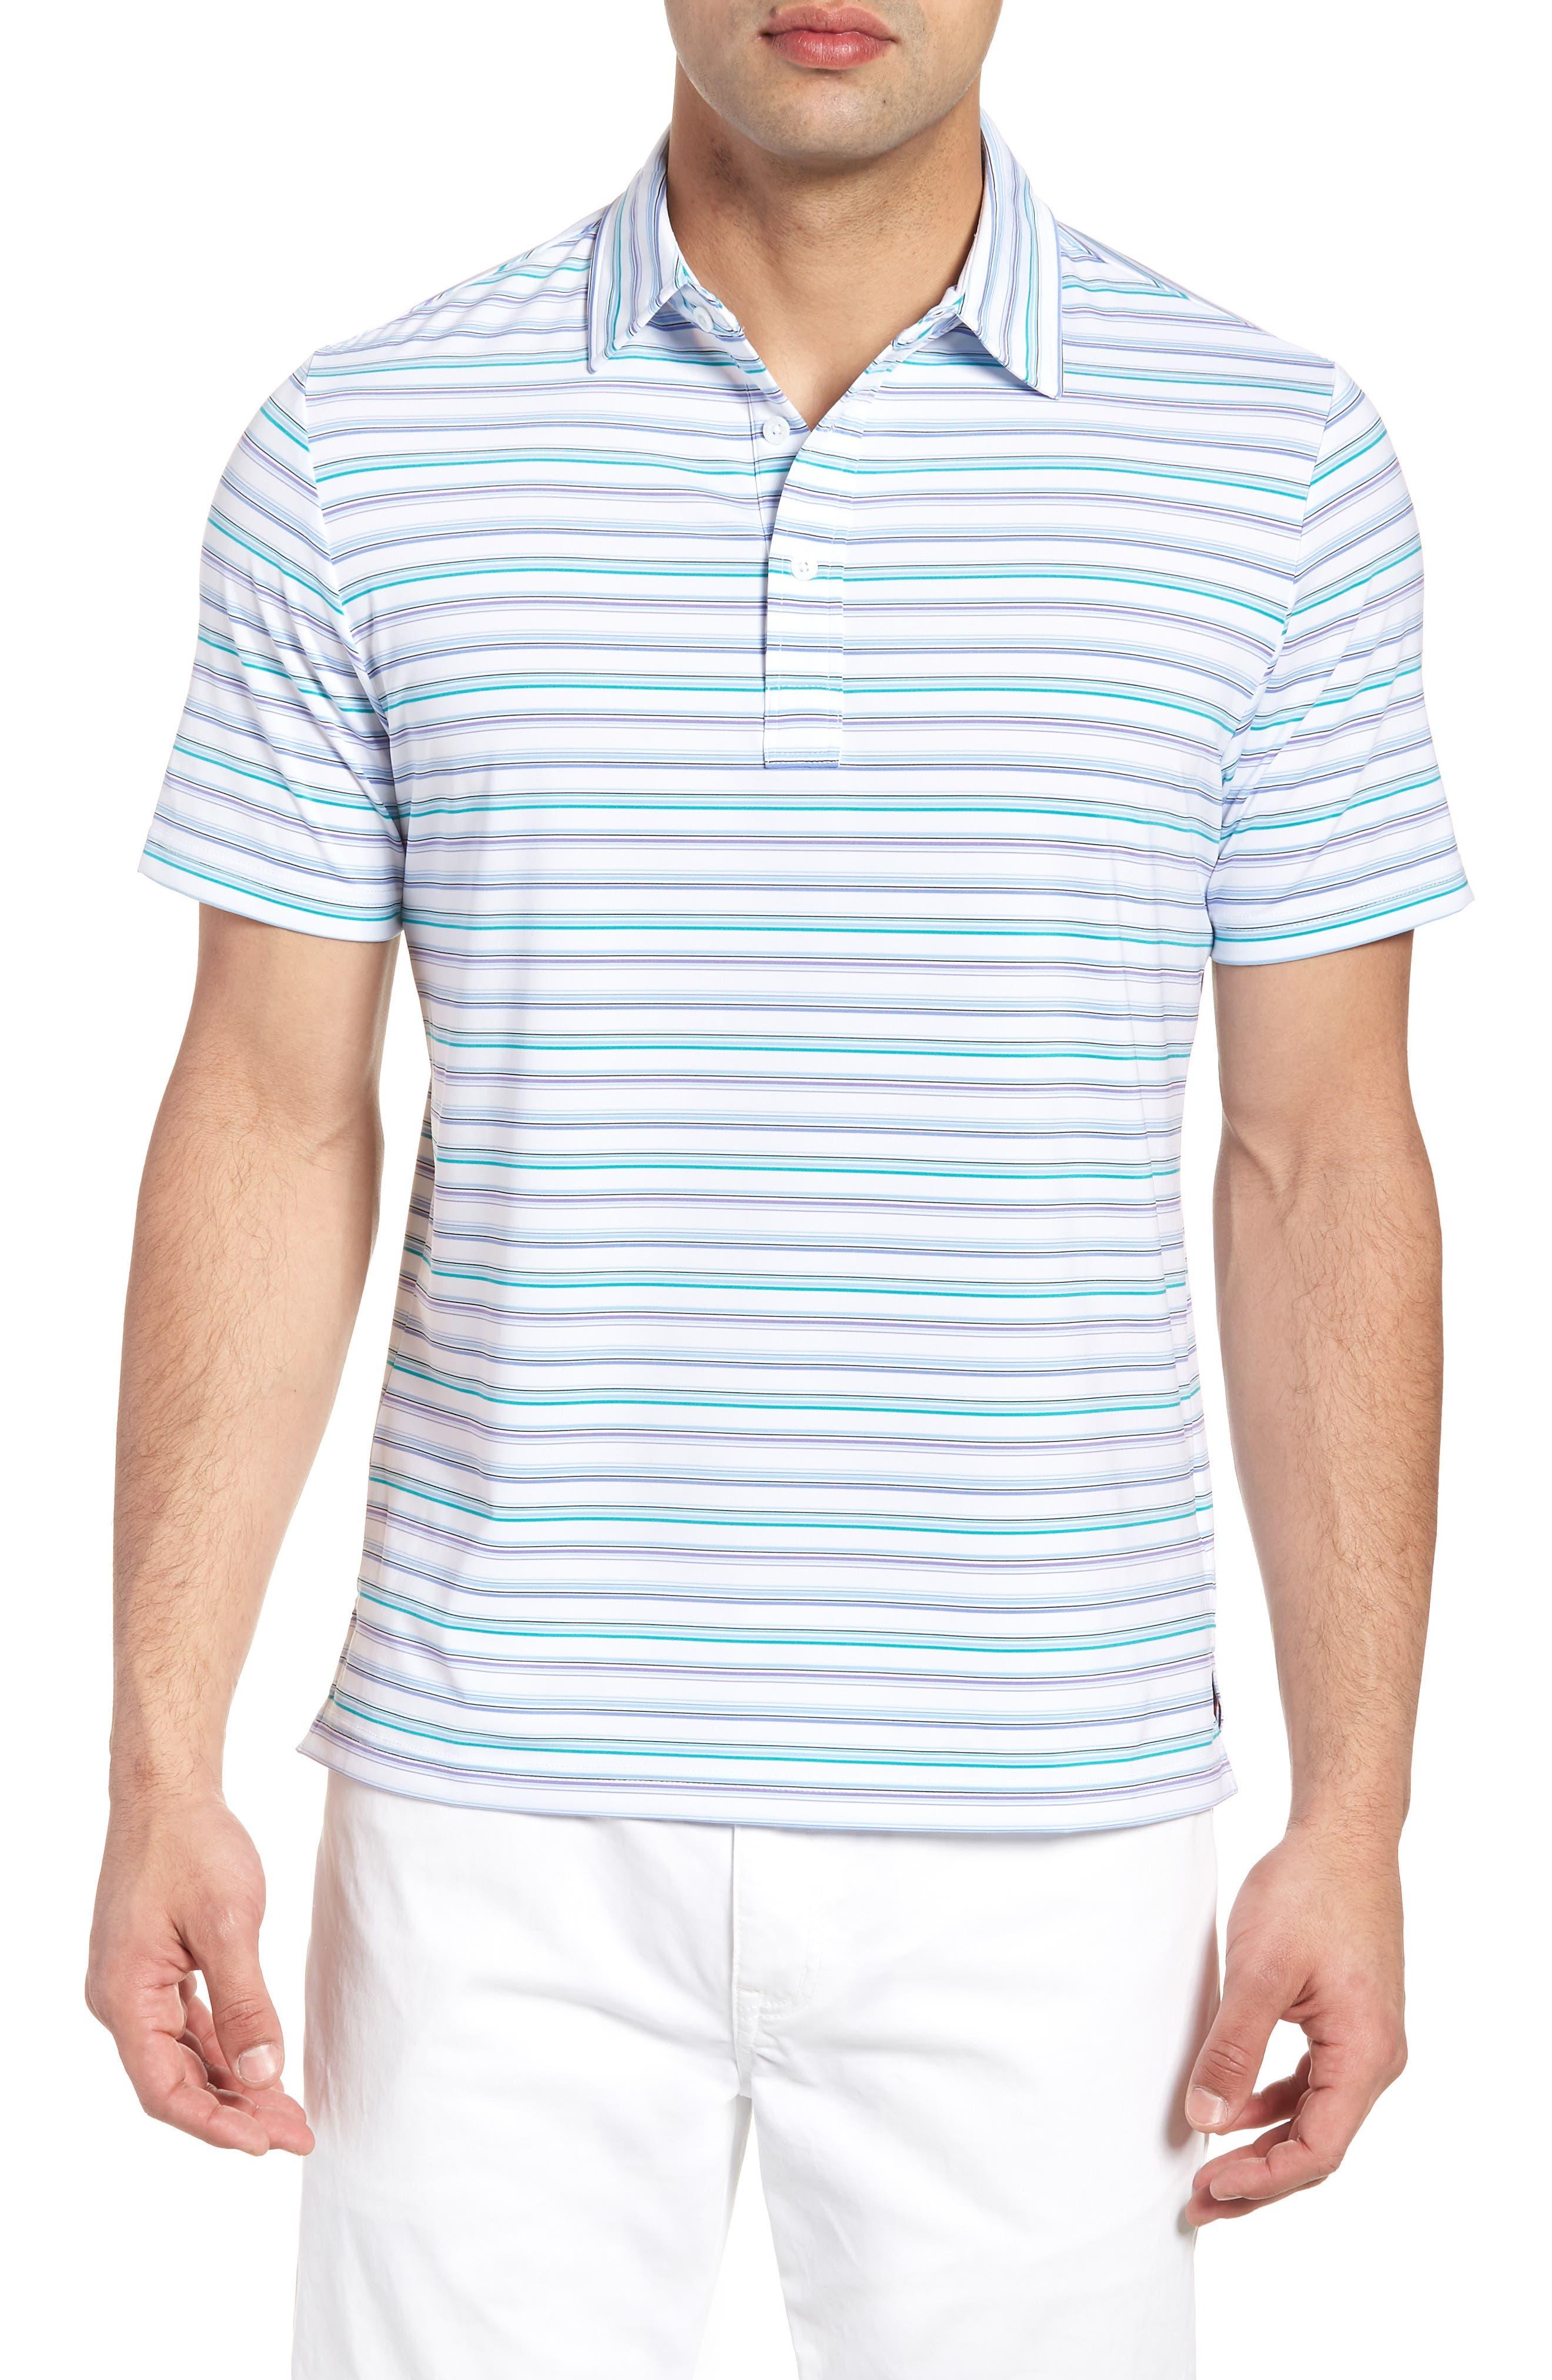 Knit Polo,                         Main,                         color, White